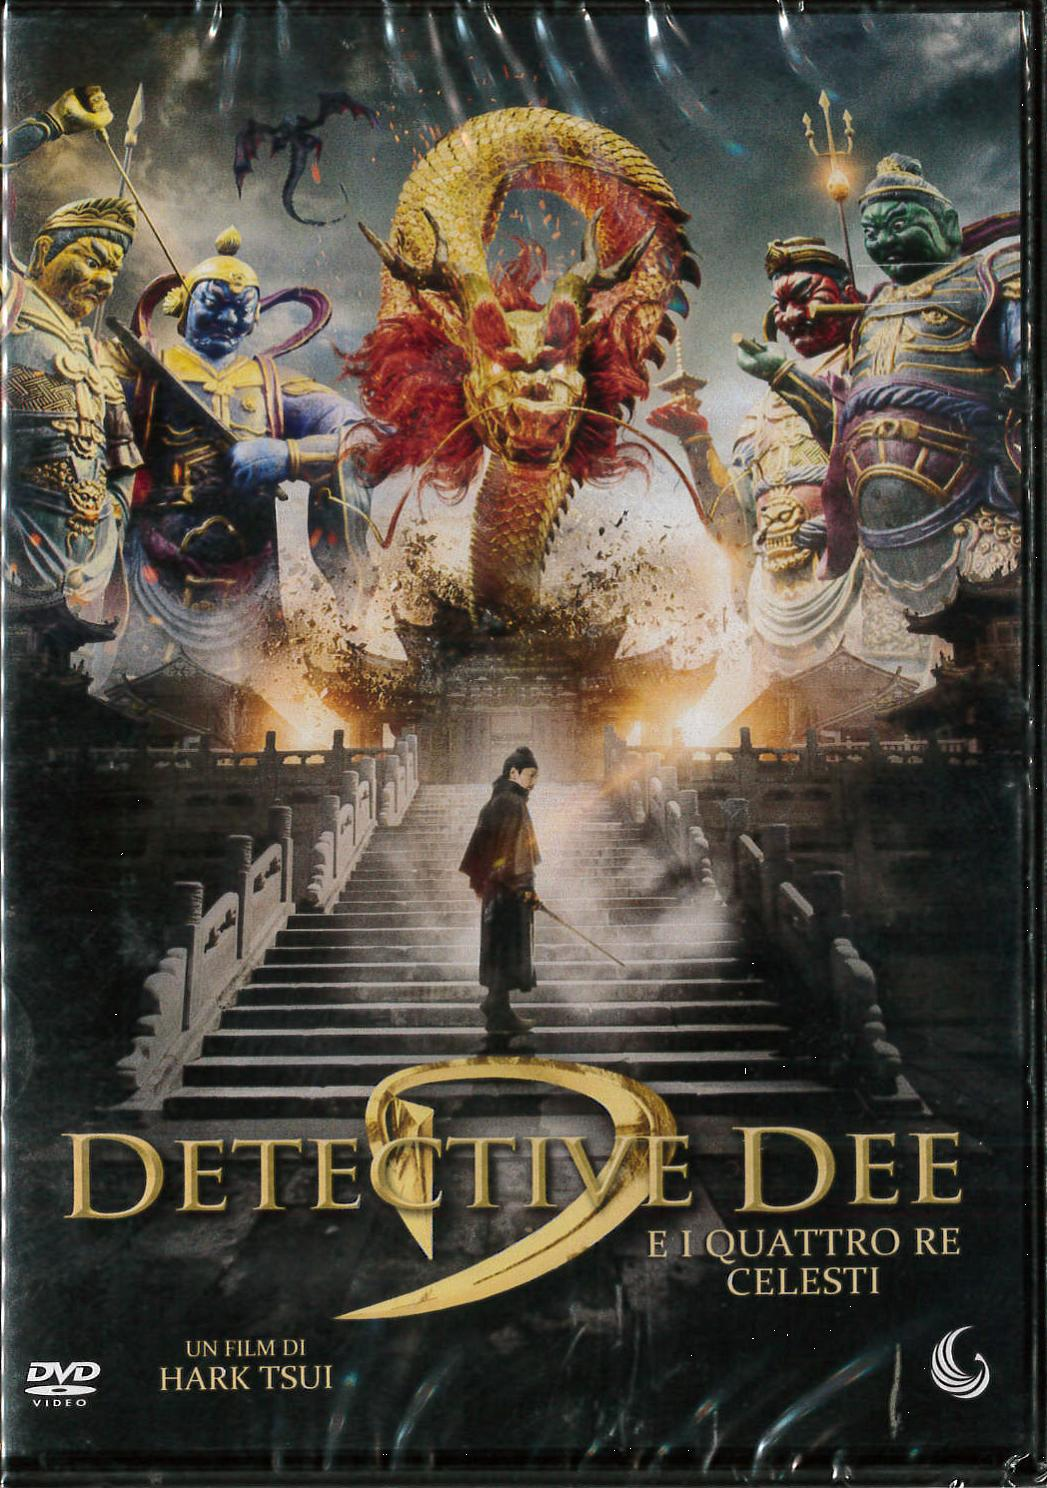 DETECTIVE DEE E I 4 RE CELESTI (DVD)